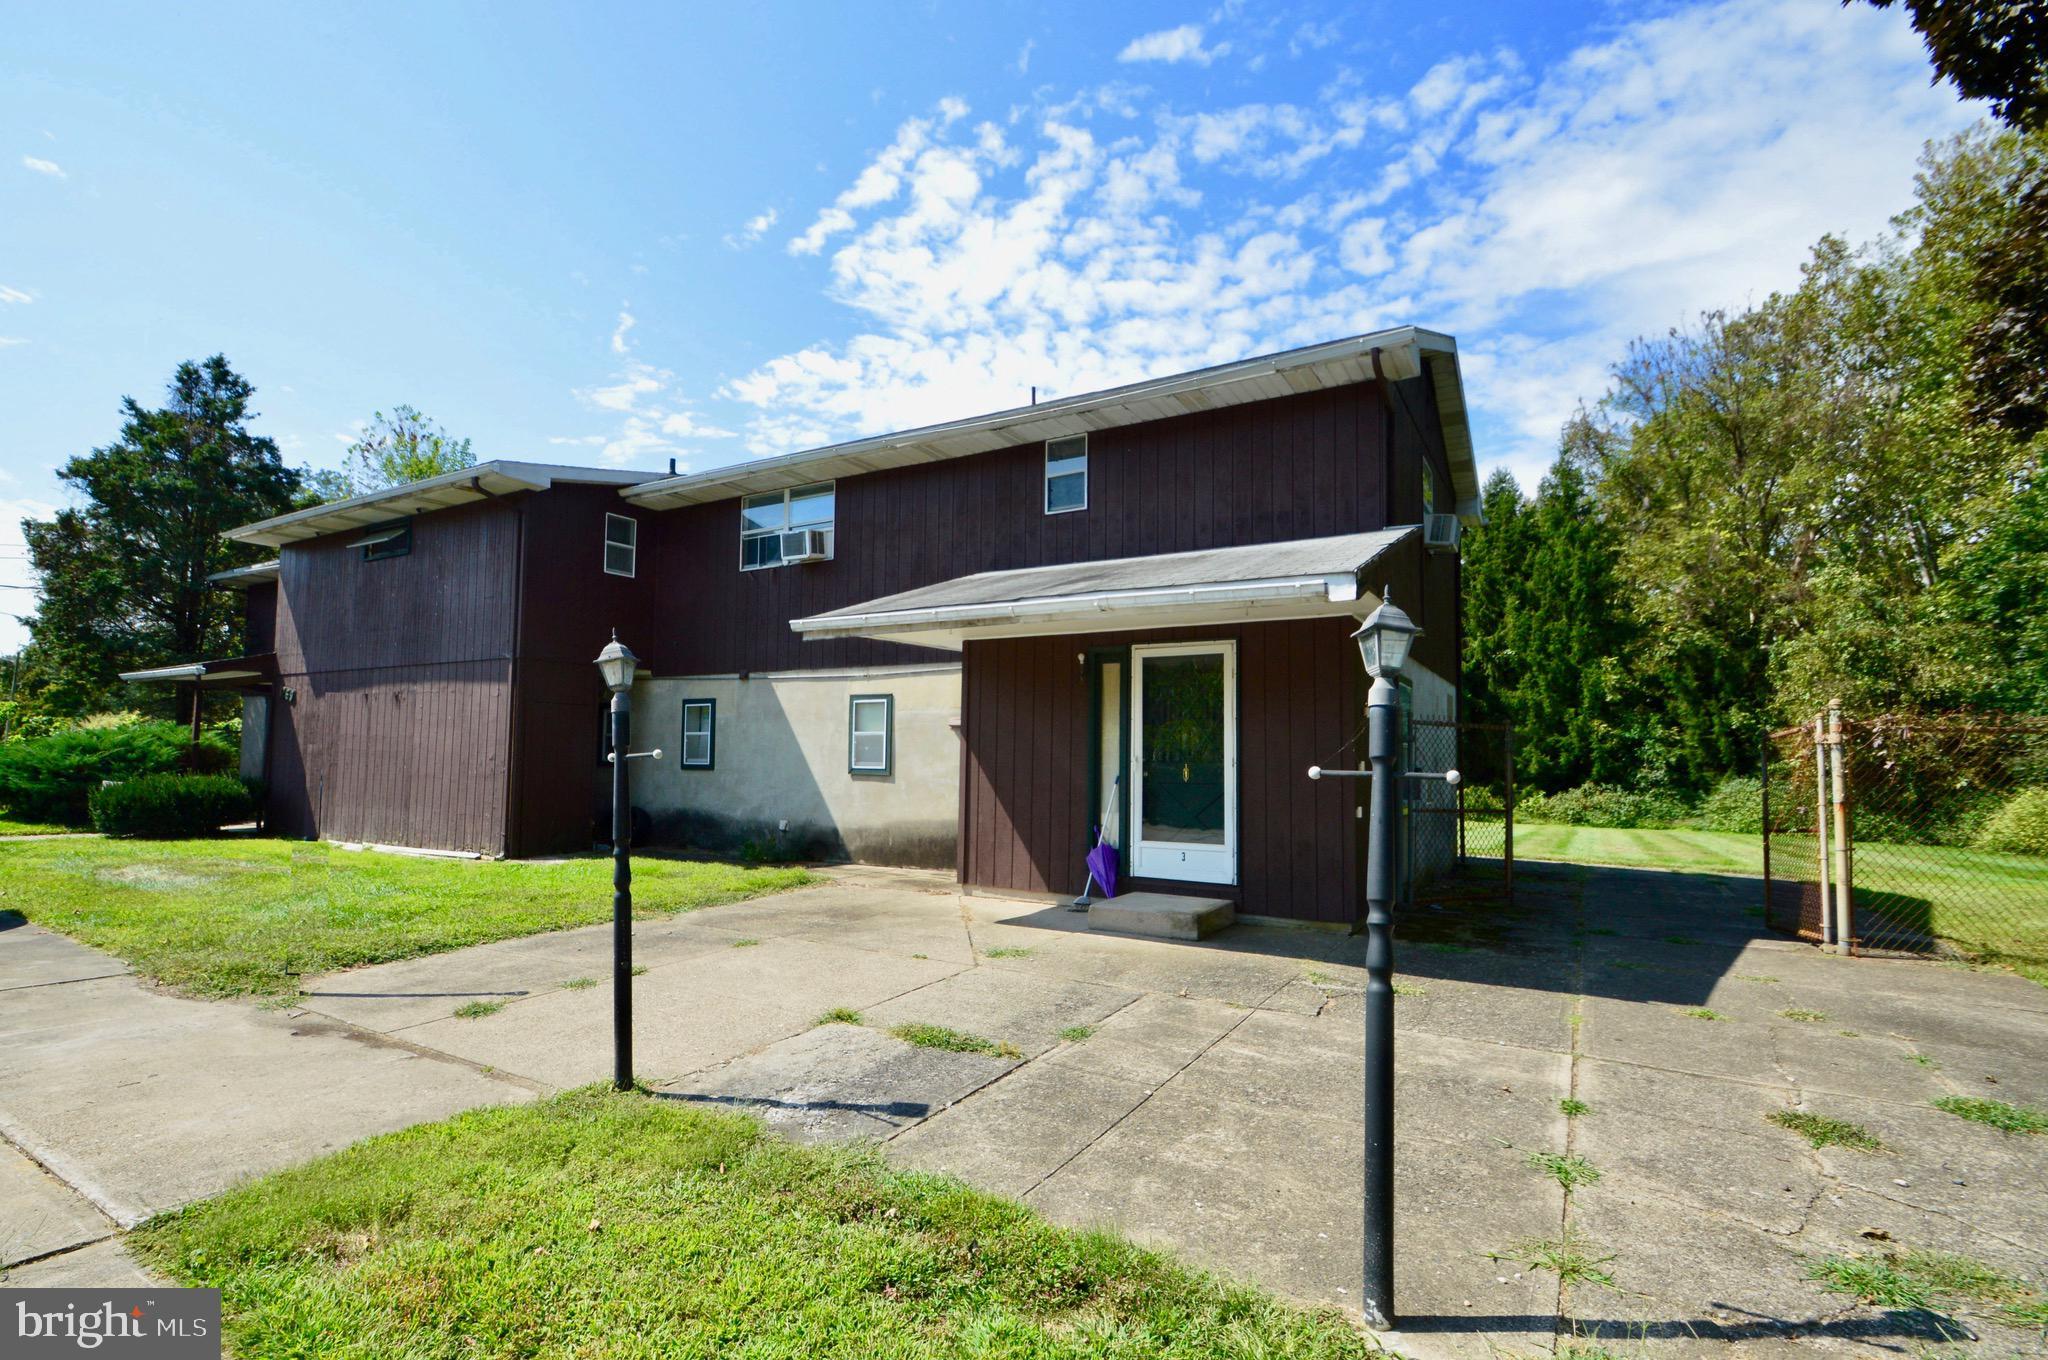 1269 Easton Road, Riegelsville, PA 18077